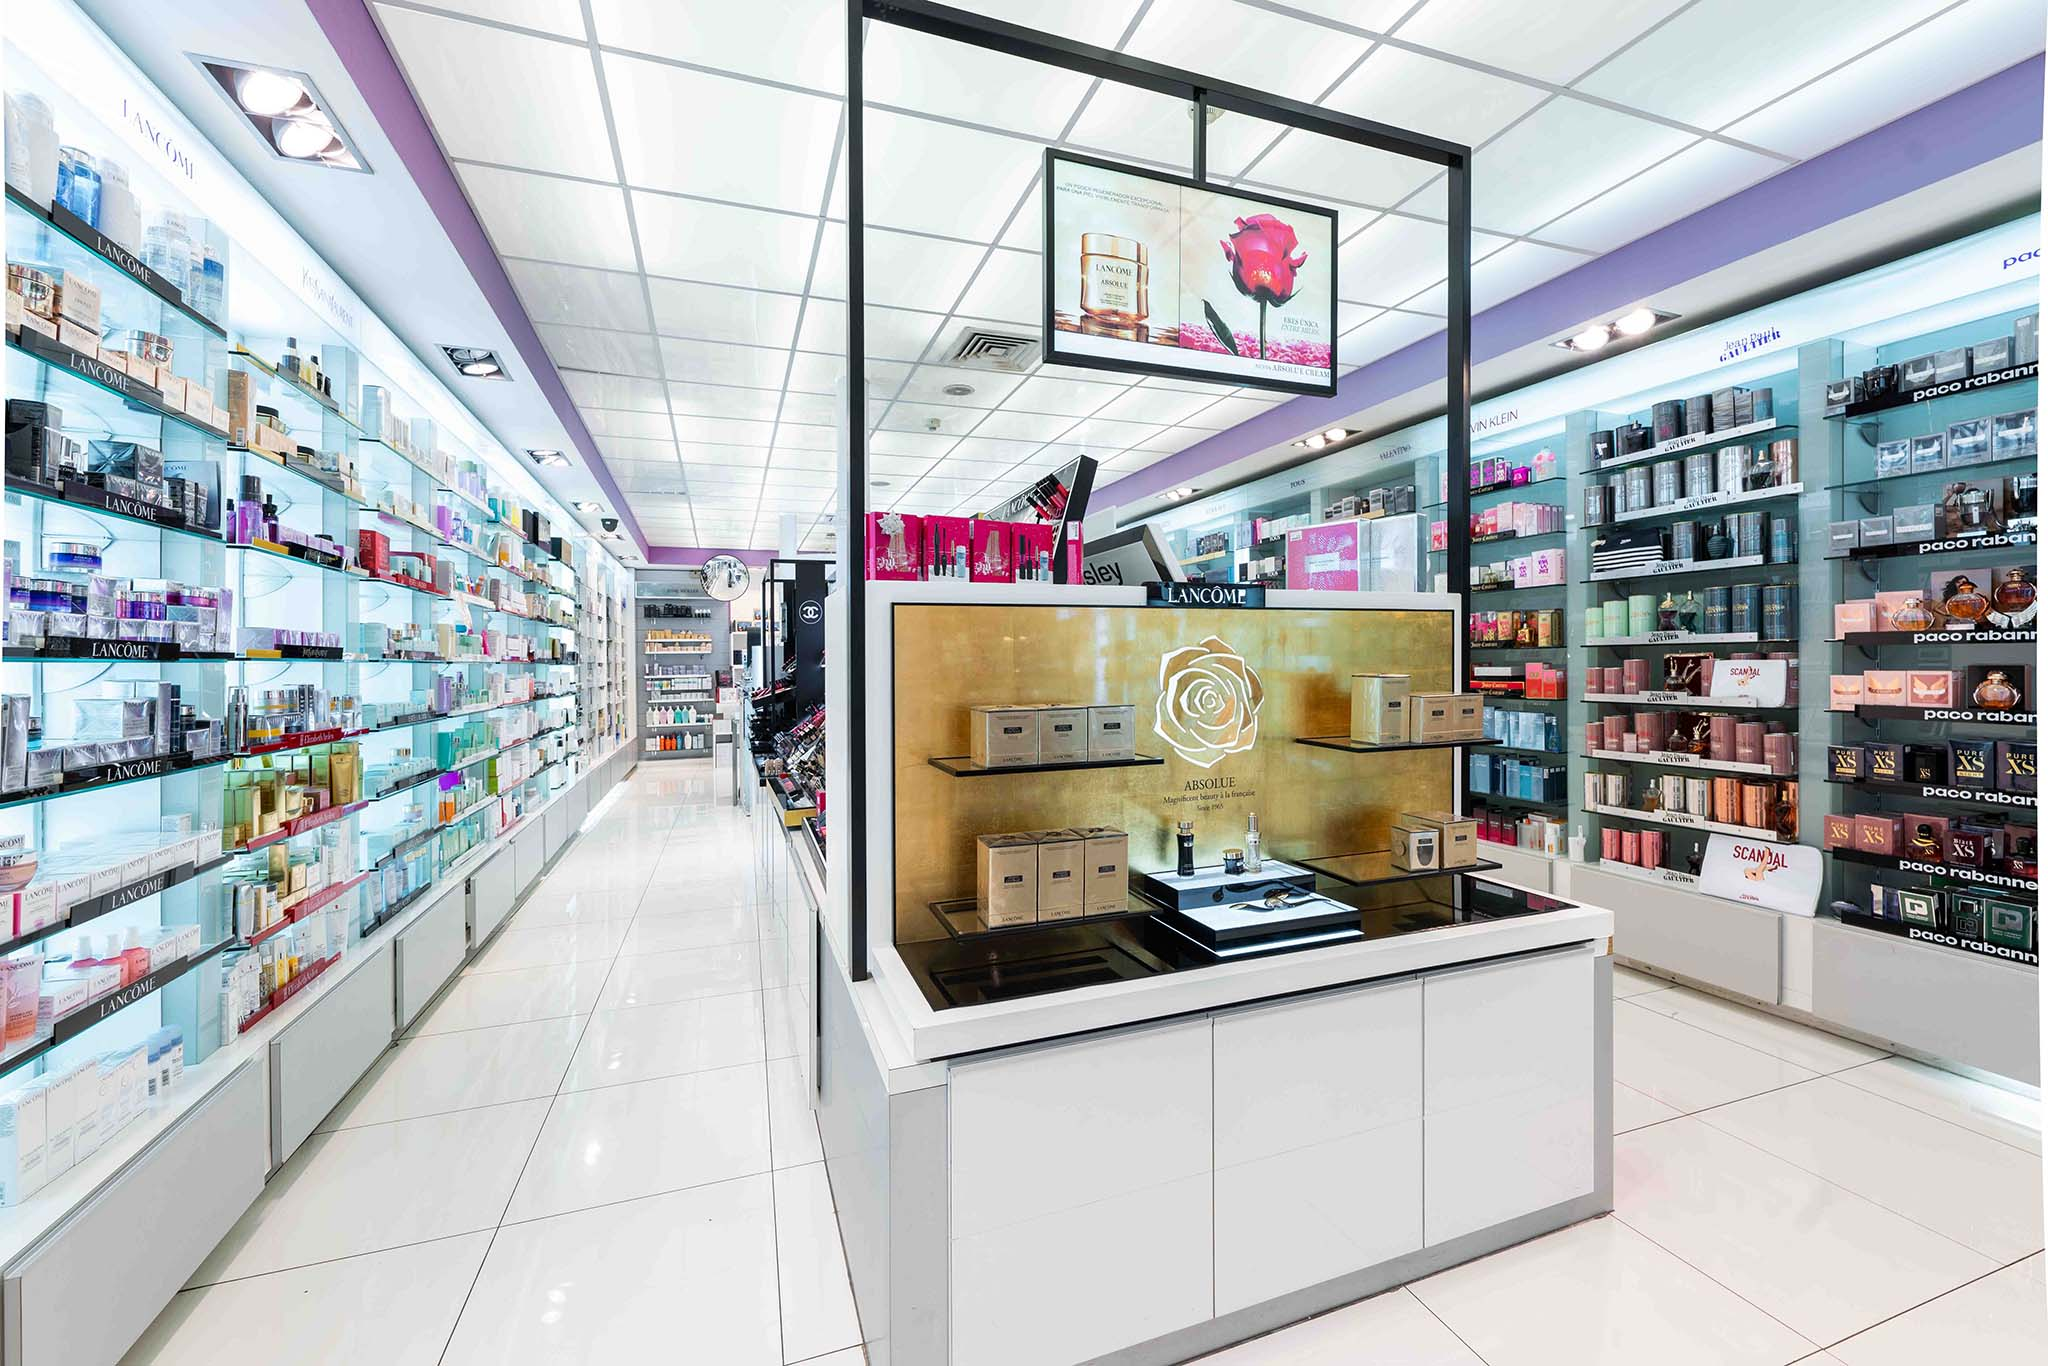 Perfumería sabina 2020 Triana